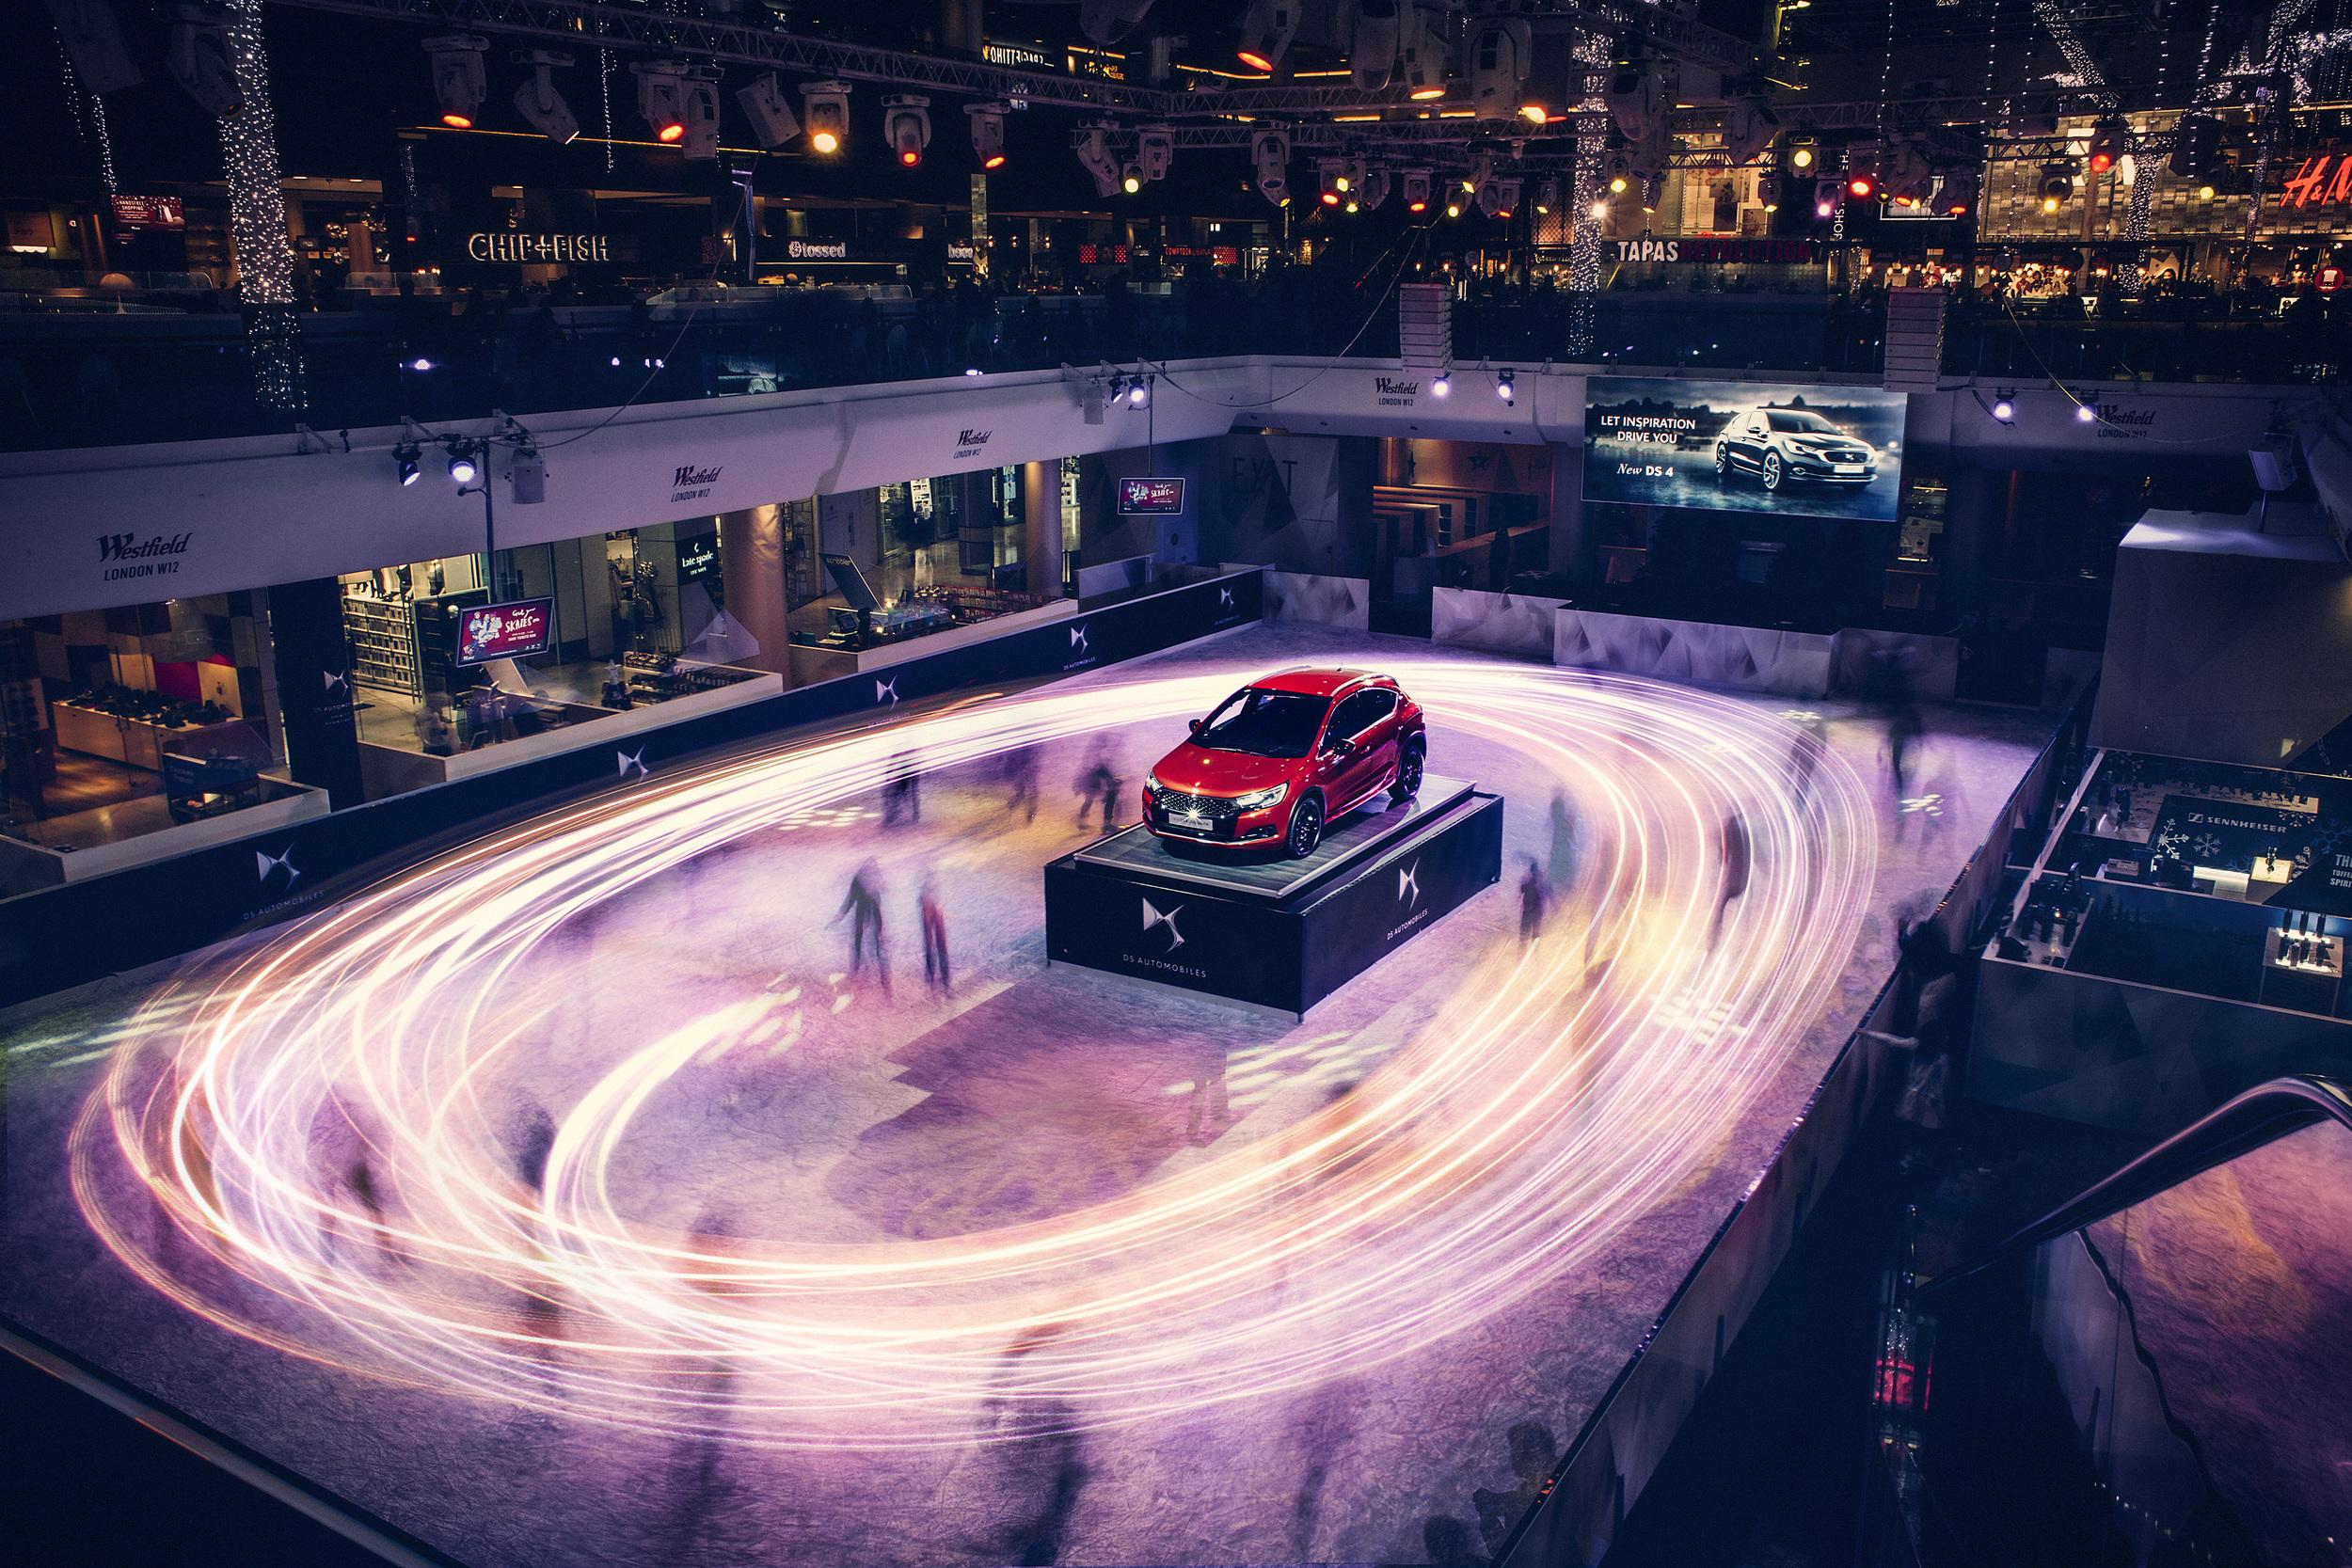 ds ice rink lights